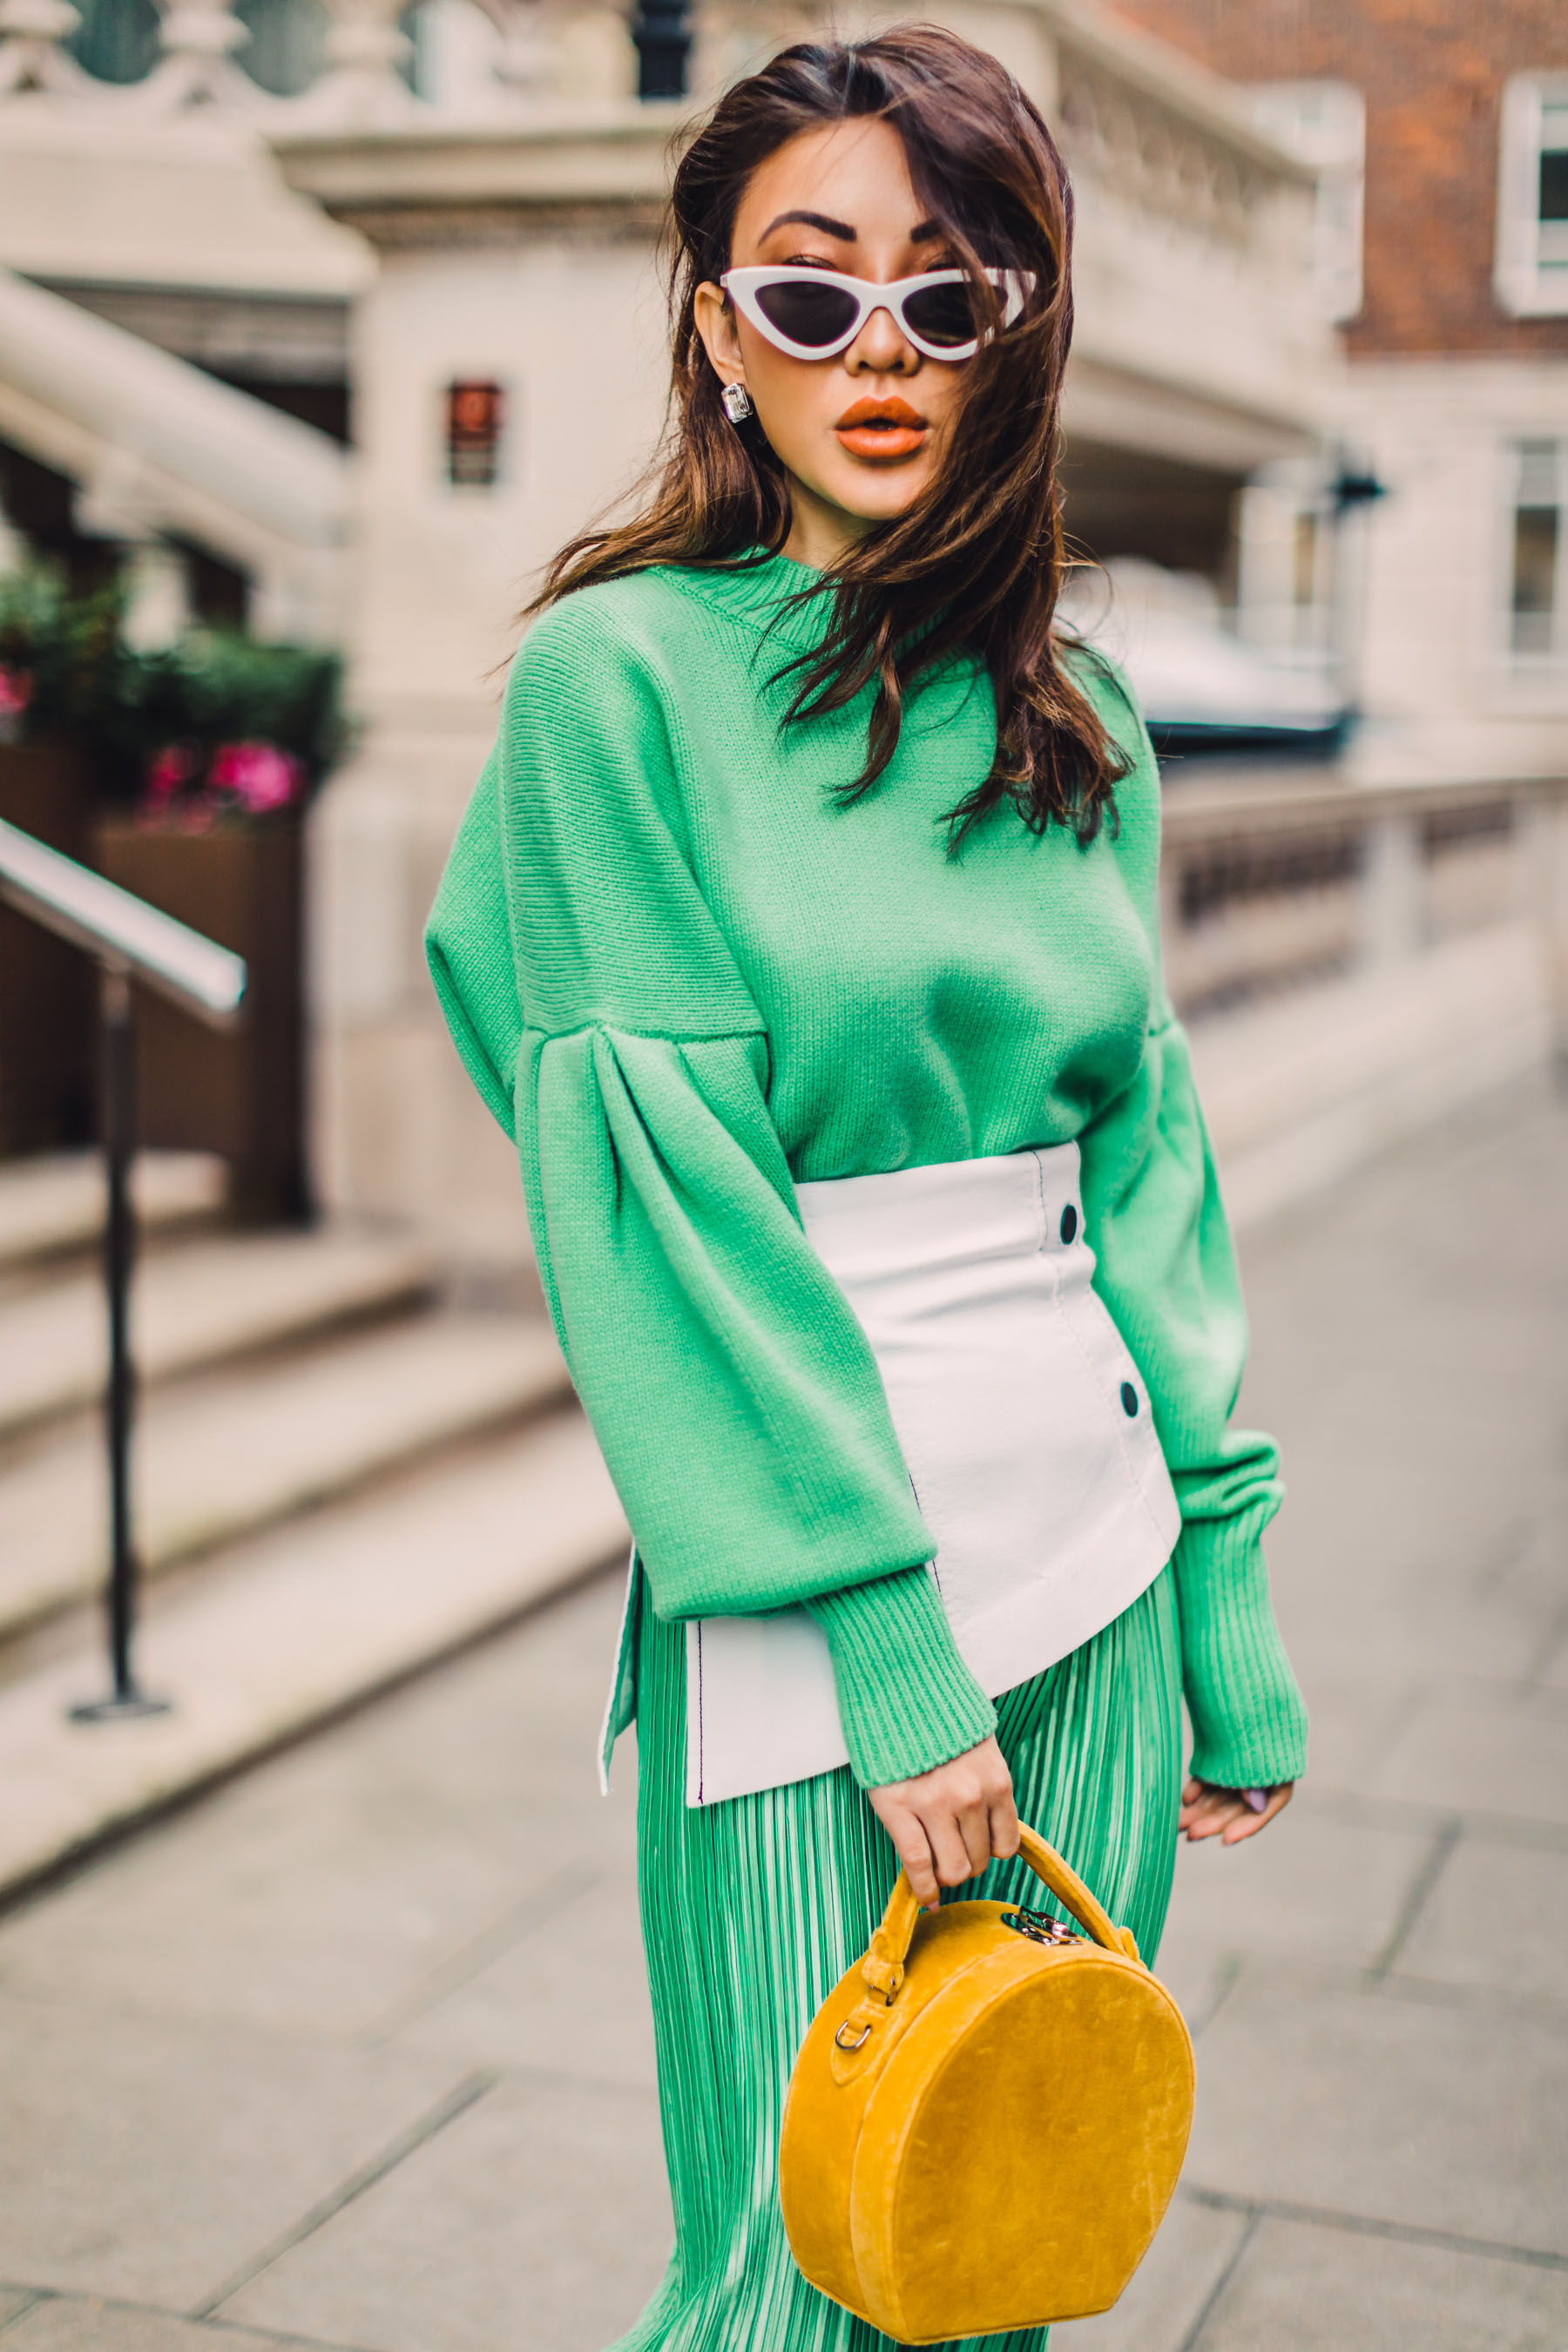 London Fashion Week Recap - green pleated dress, white corset belt, yellow handbag, white attico pumps // Notjessfashion.com